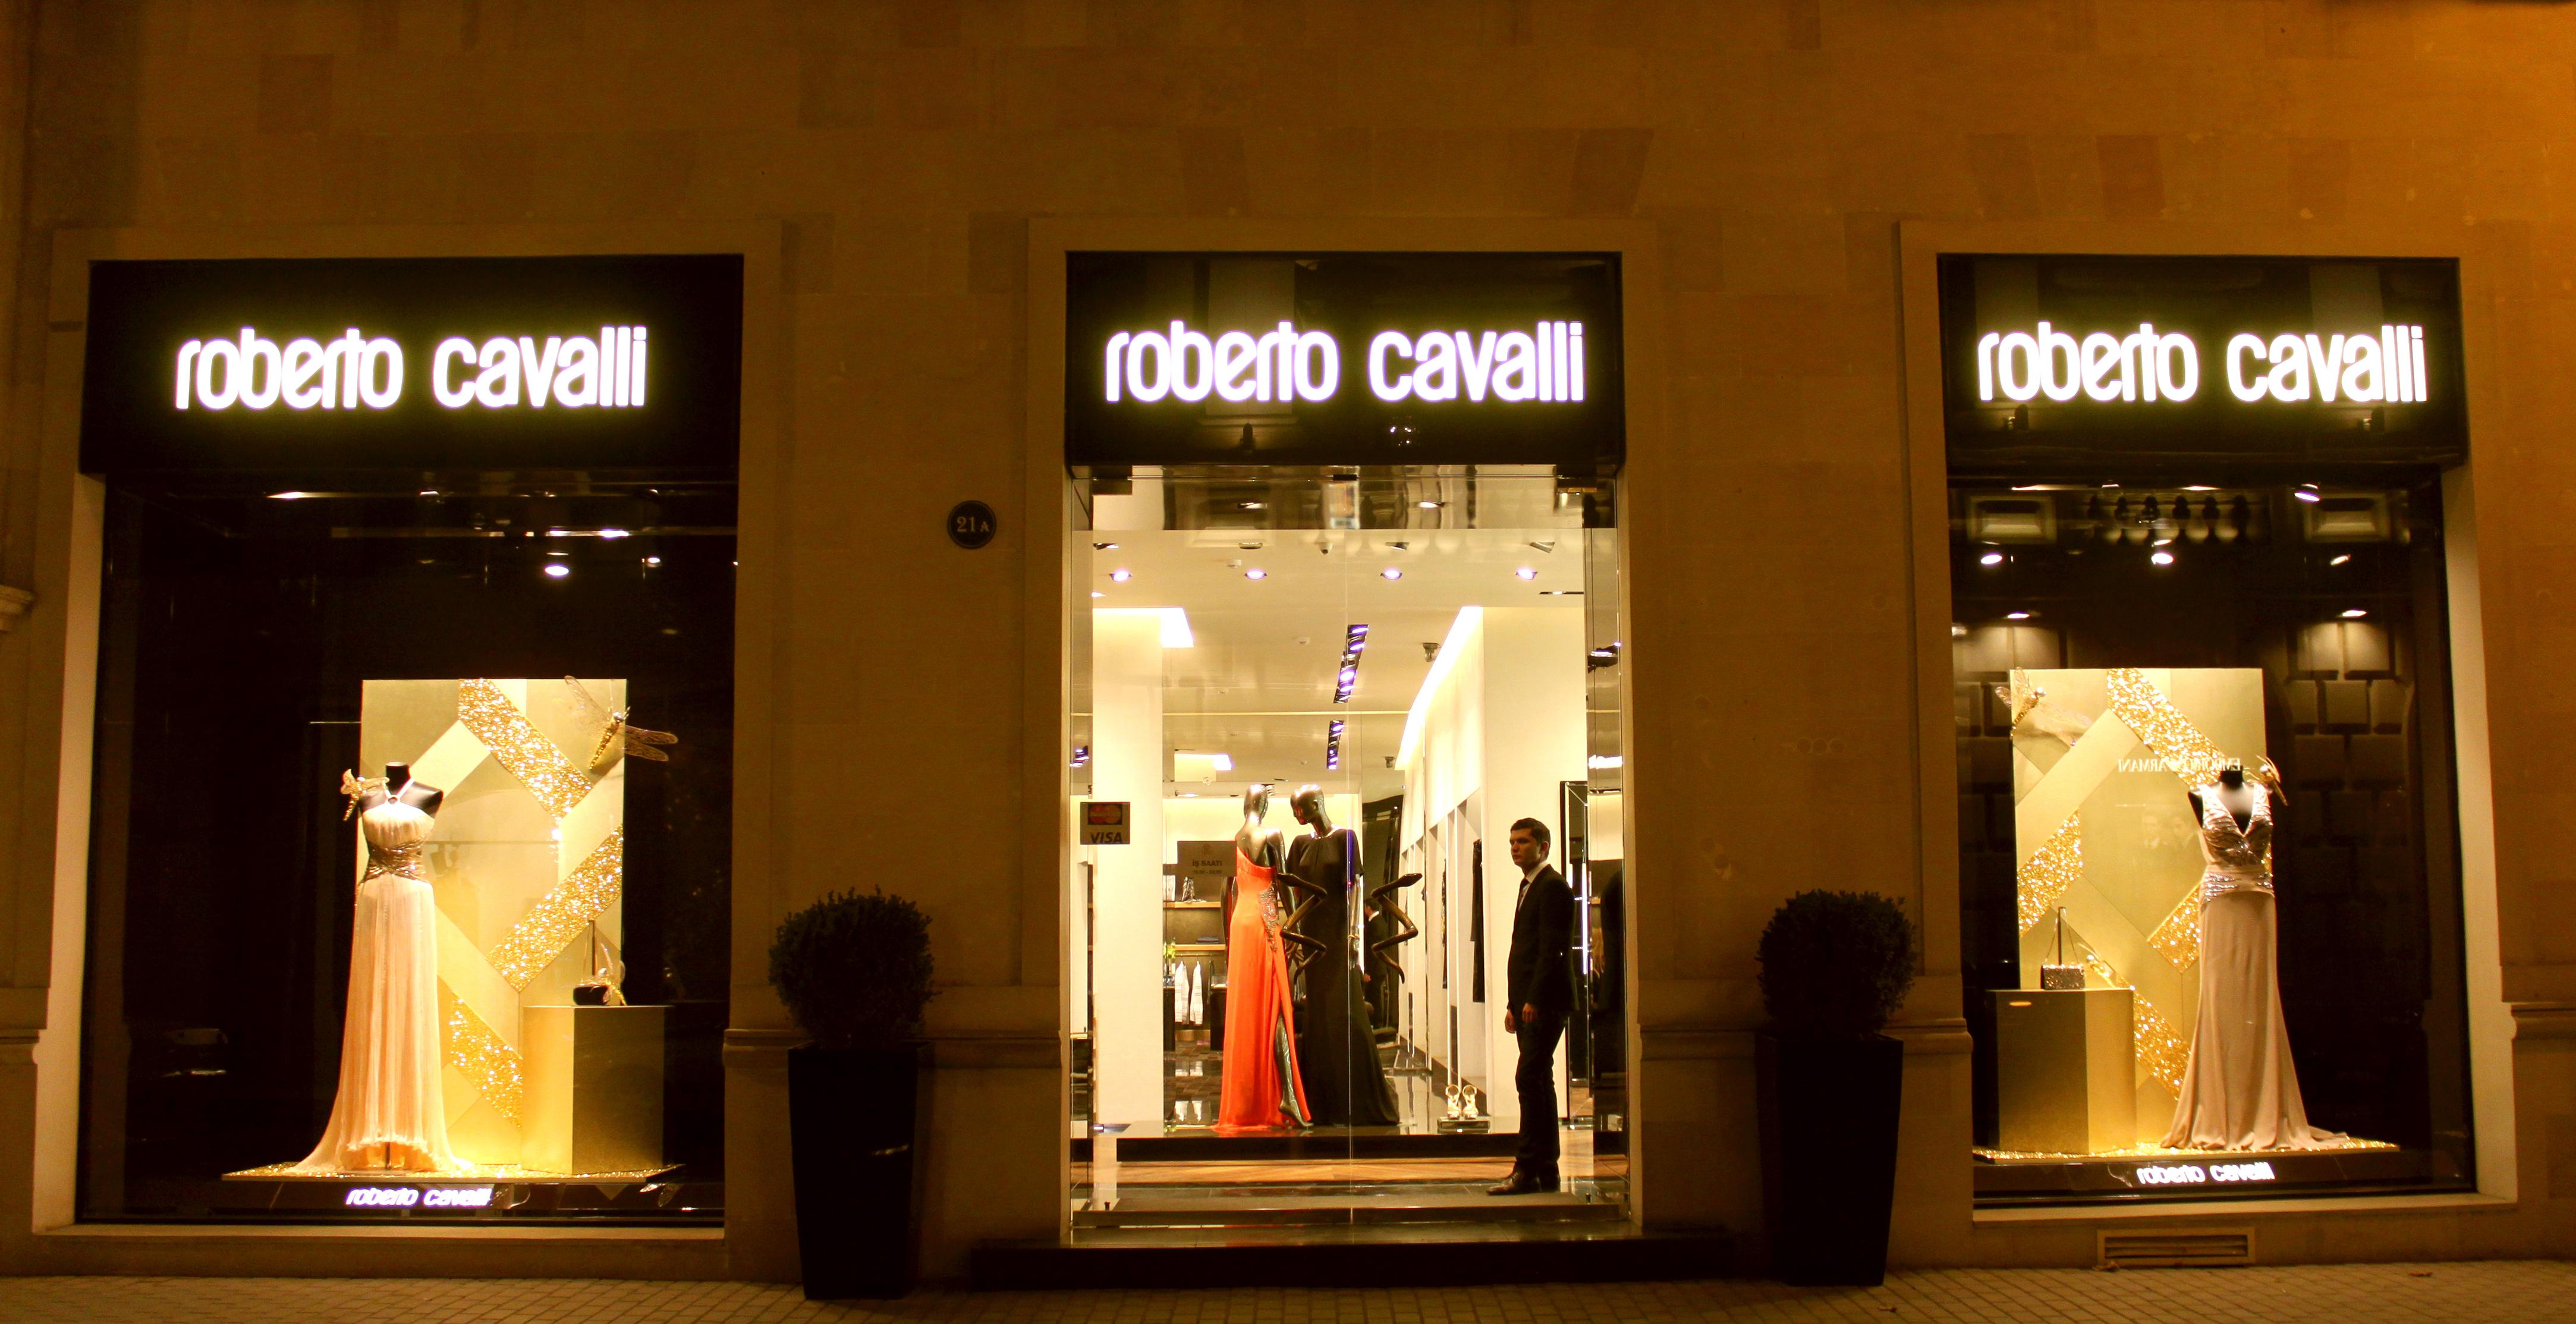 File:Roberto Cavalli boutique in Baku.JPG - Wikimedia Commons